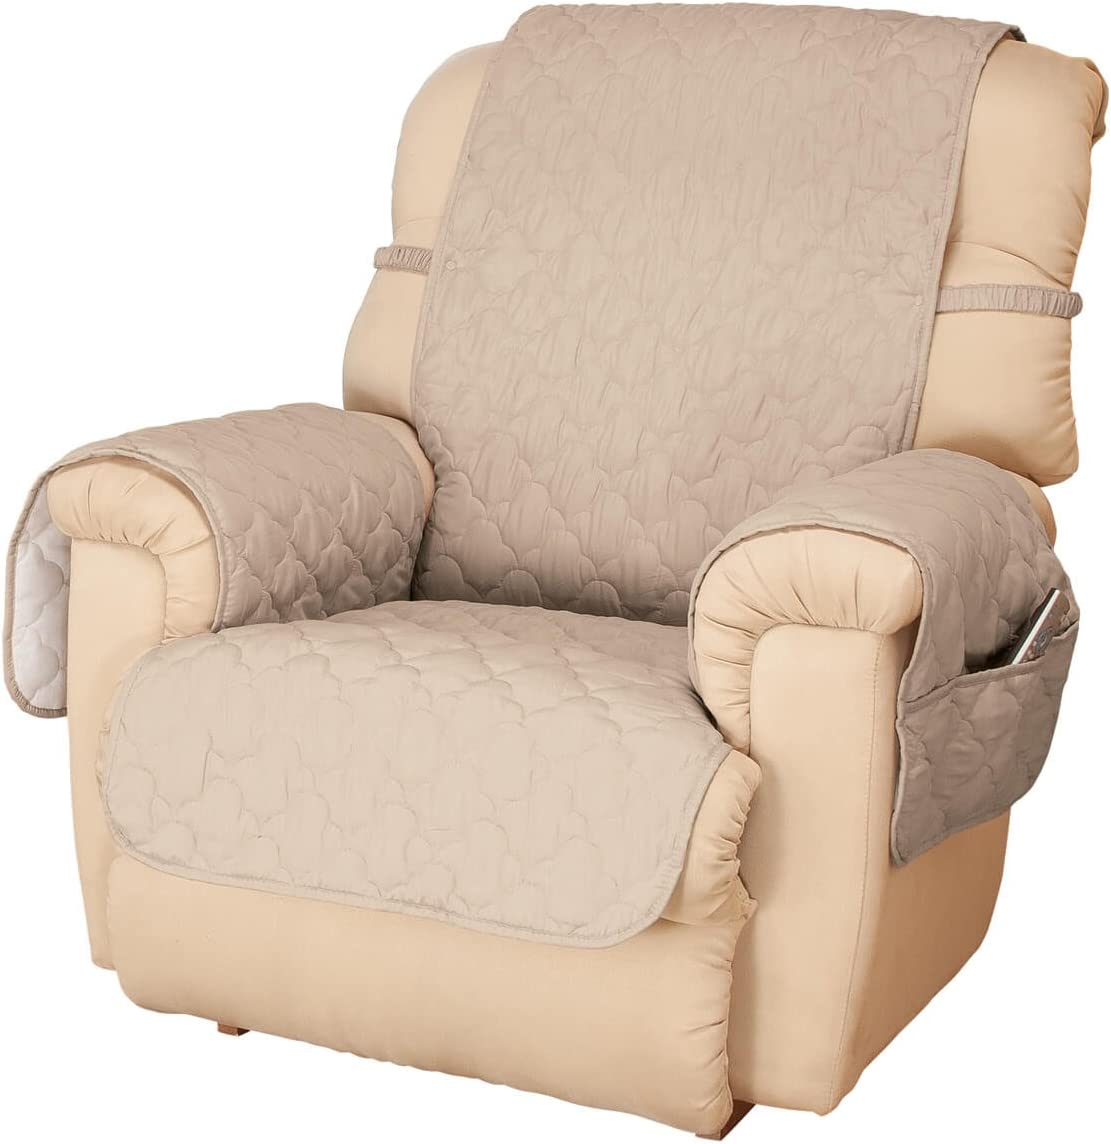 Bargain OakRidge Deluxe Microfiber Recliner Chair Beige Cover trust